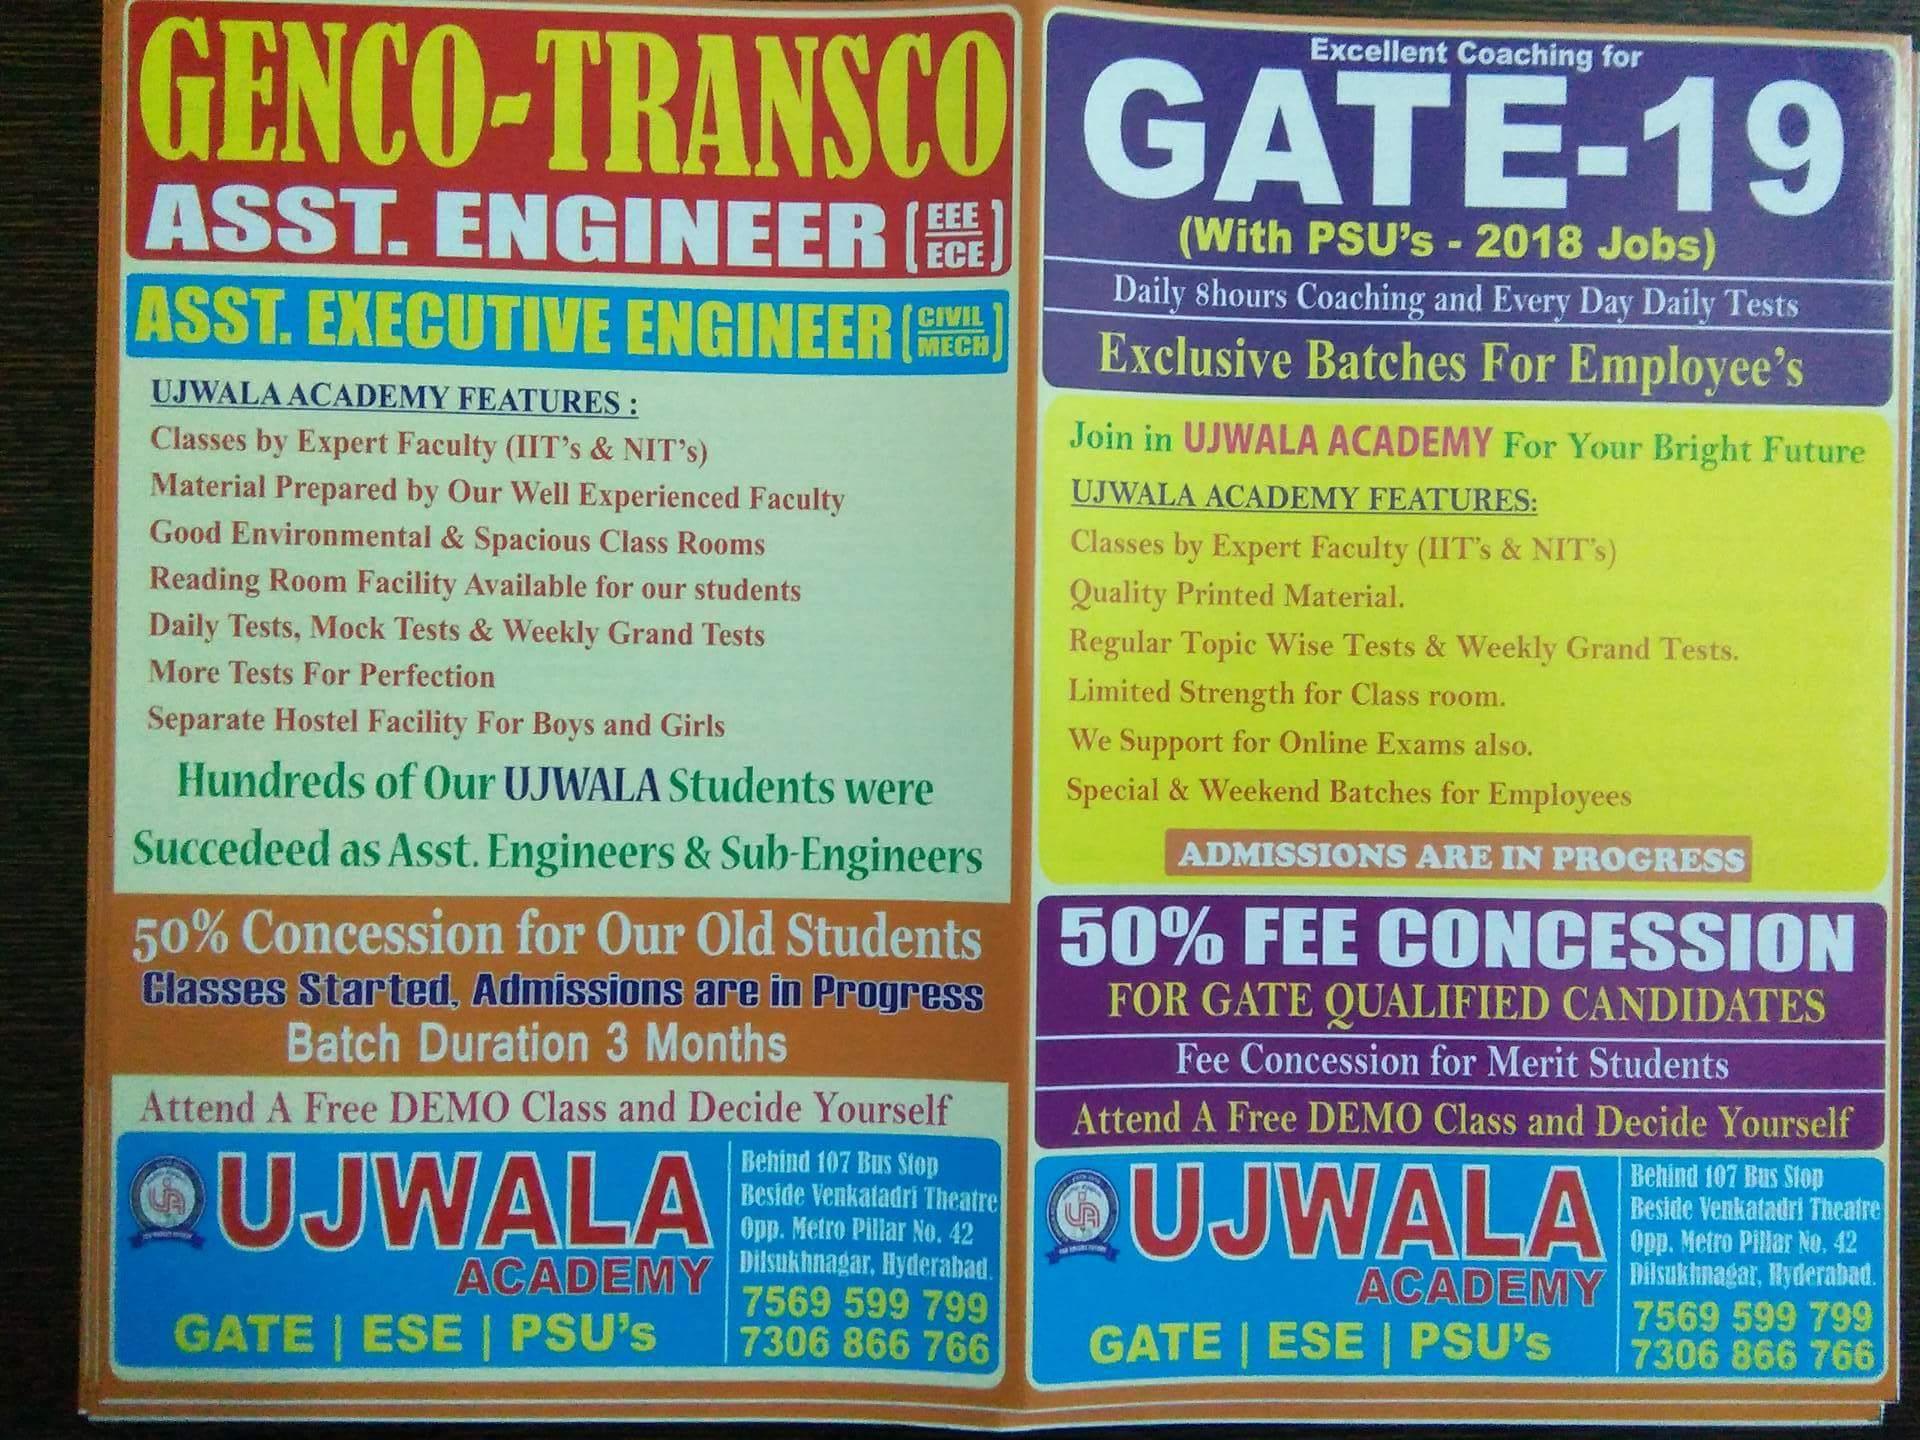 GATE Coaching Classes in Dilsukh Nagar, Hyderabad | Sulekha